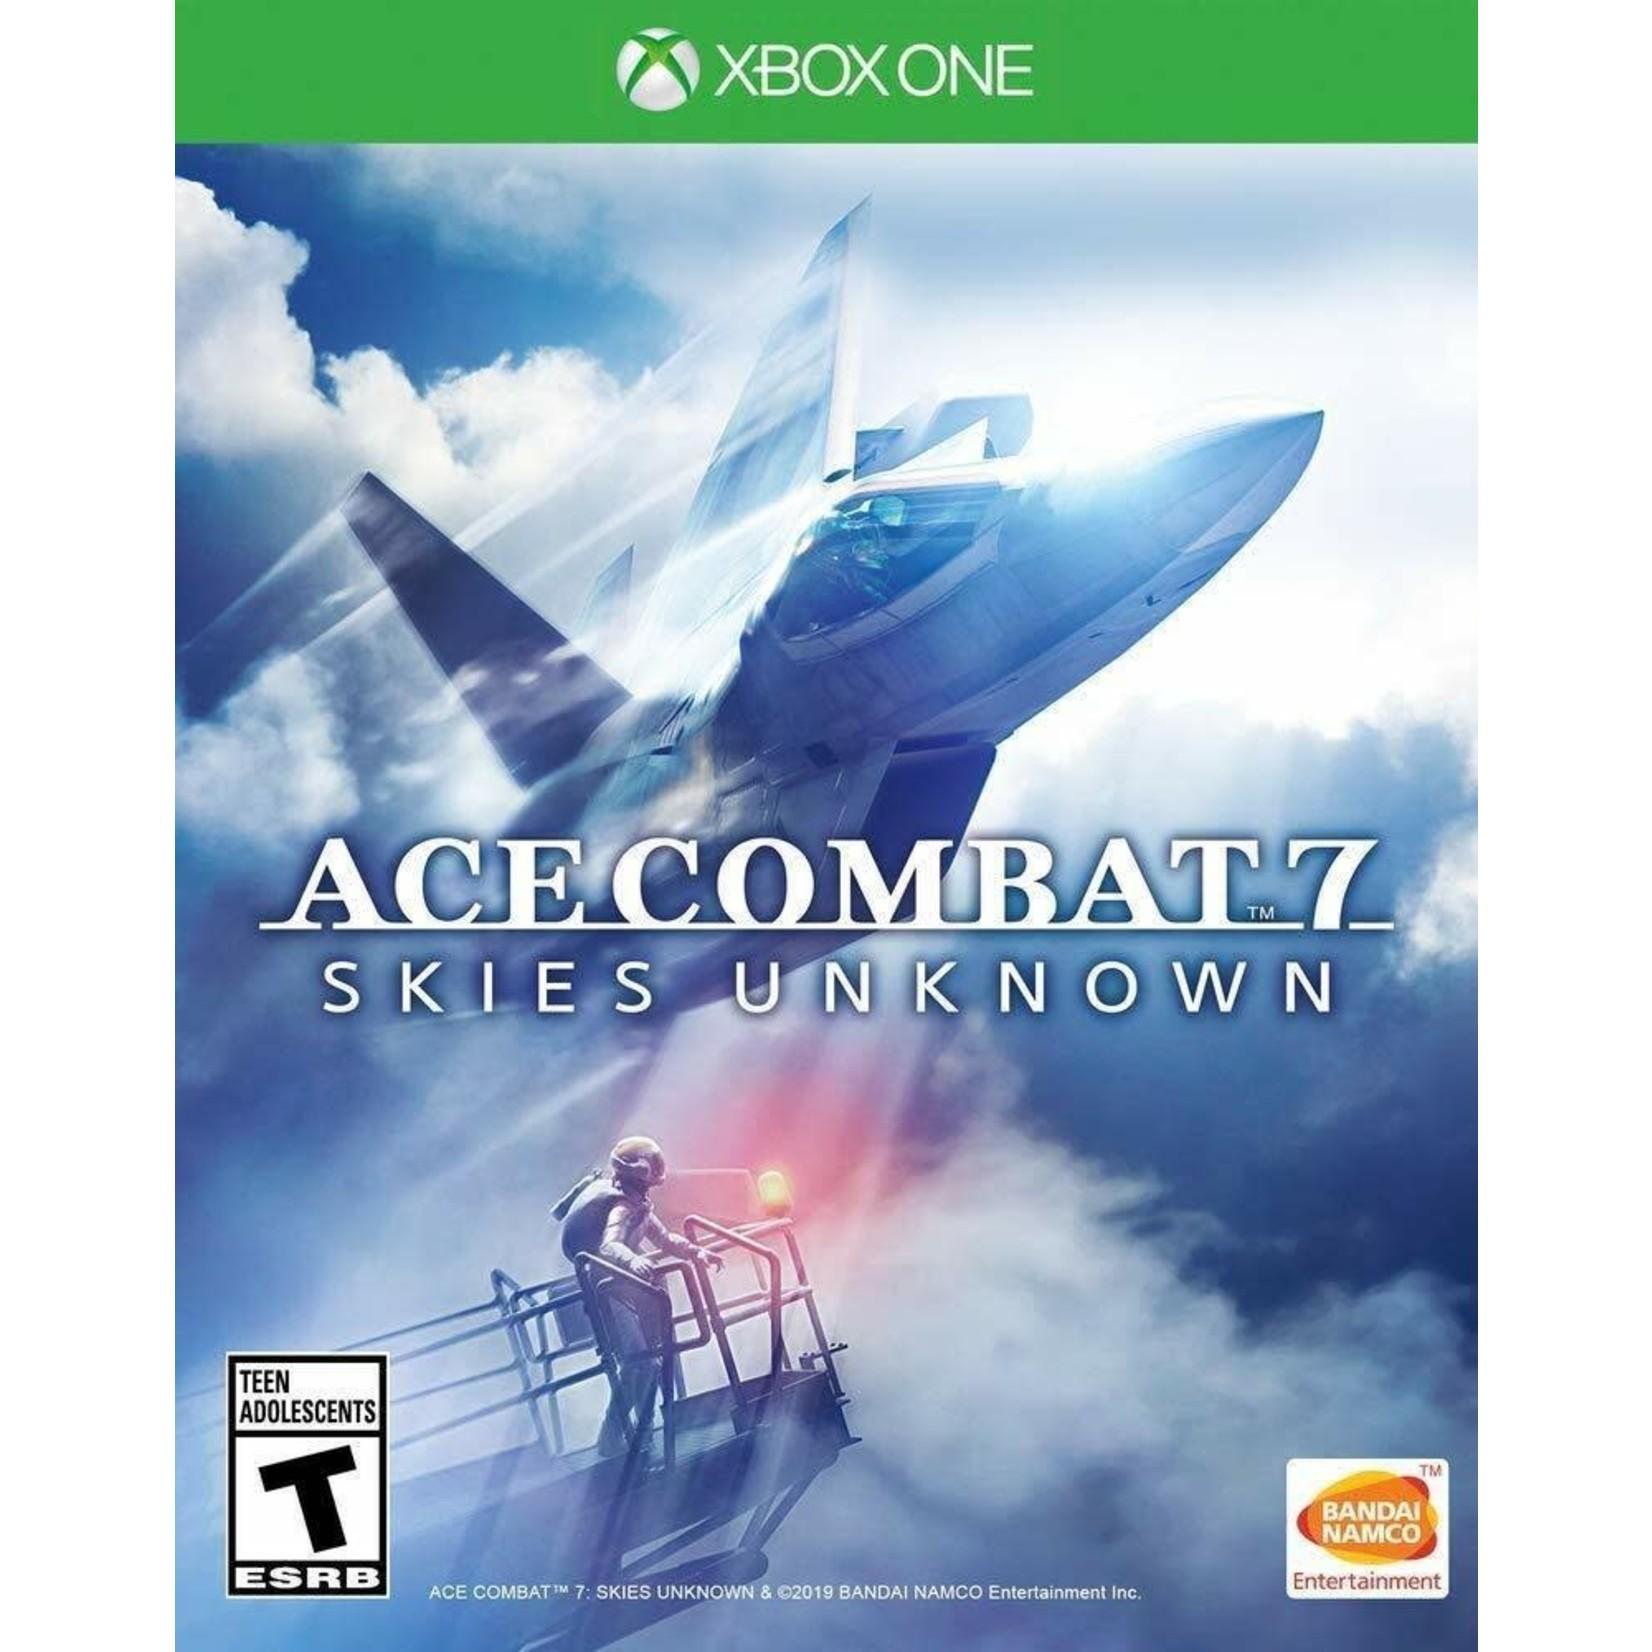 Xb1u-Ace Combat 7 Skies Unknown